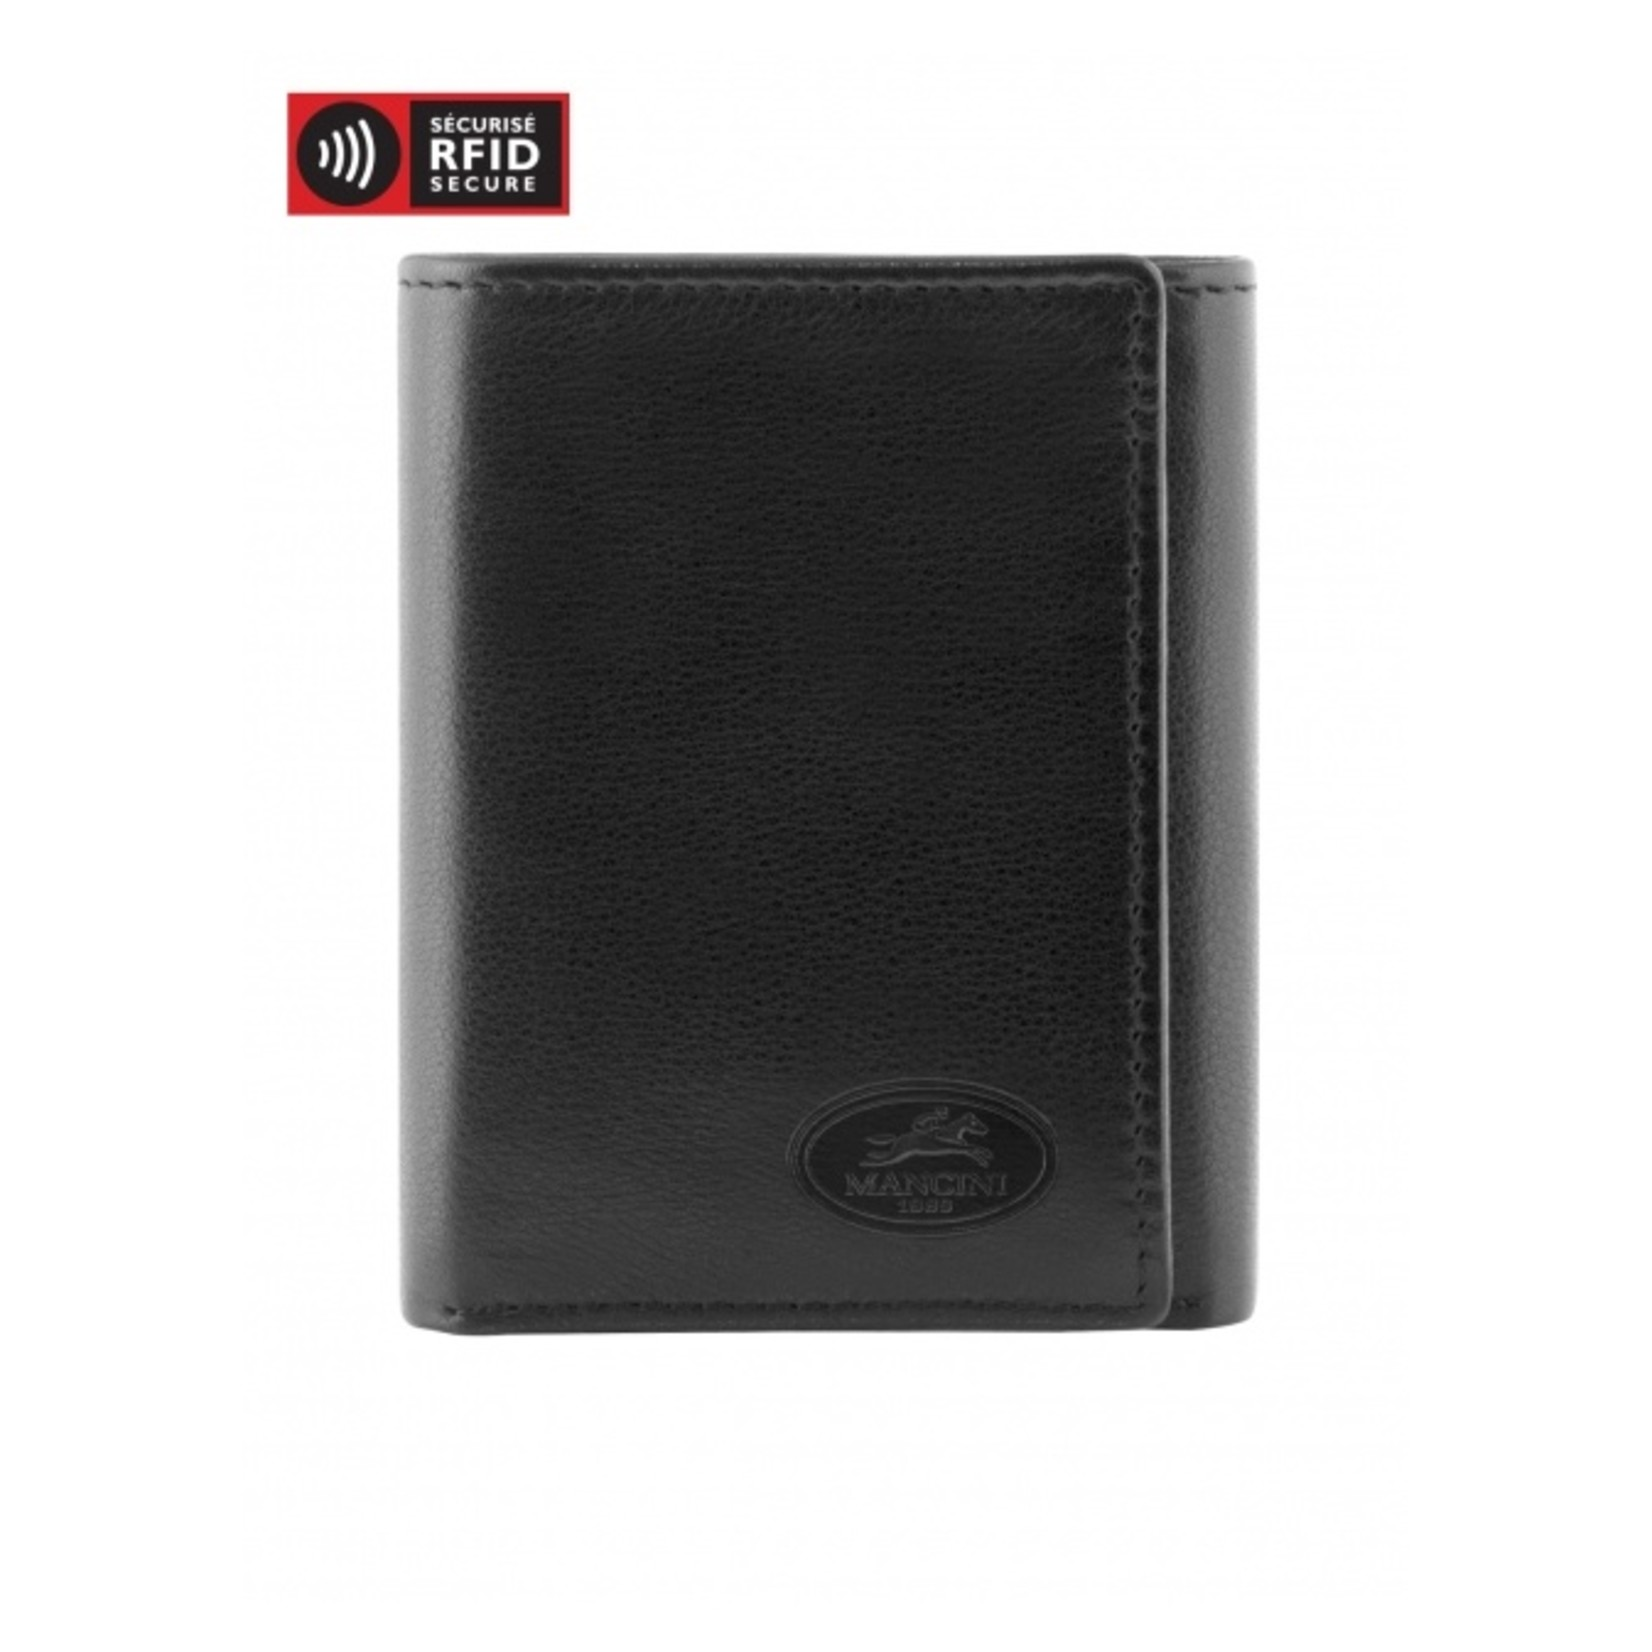 Mancini Mancini 2010103 Tri-fold Wallet